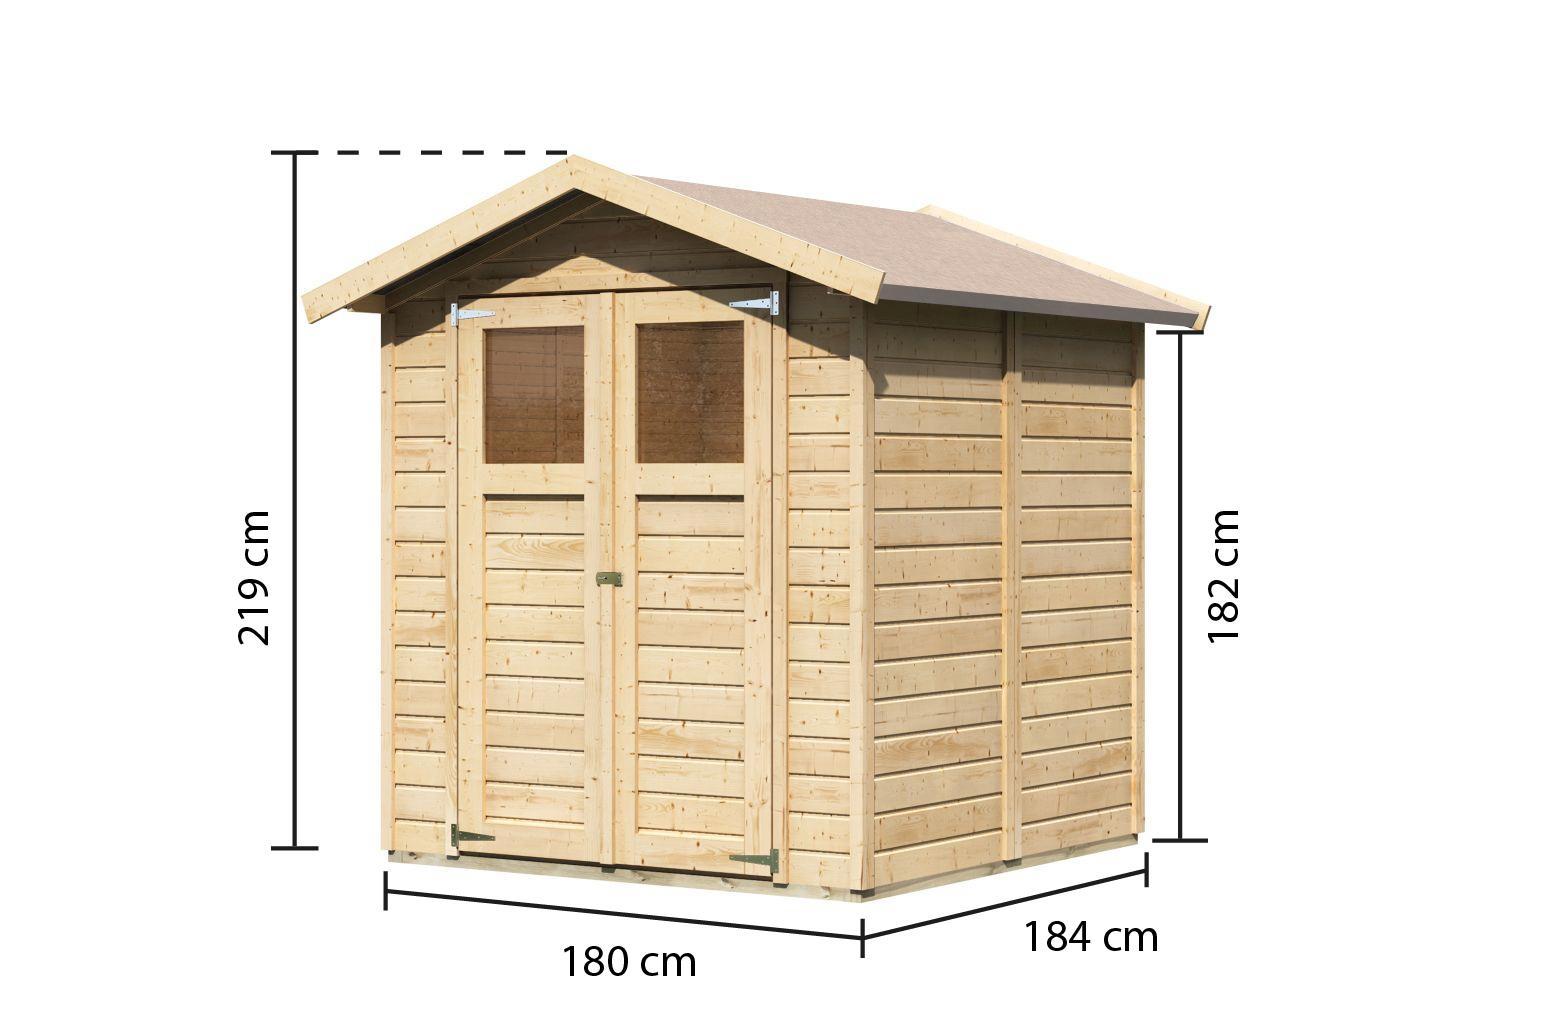 dřevěný domek KARIBU DAHME 3 (14517) SET